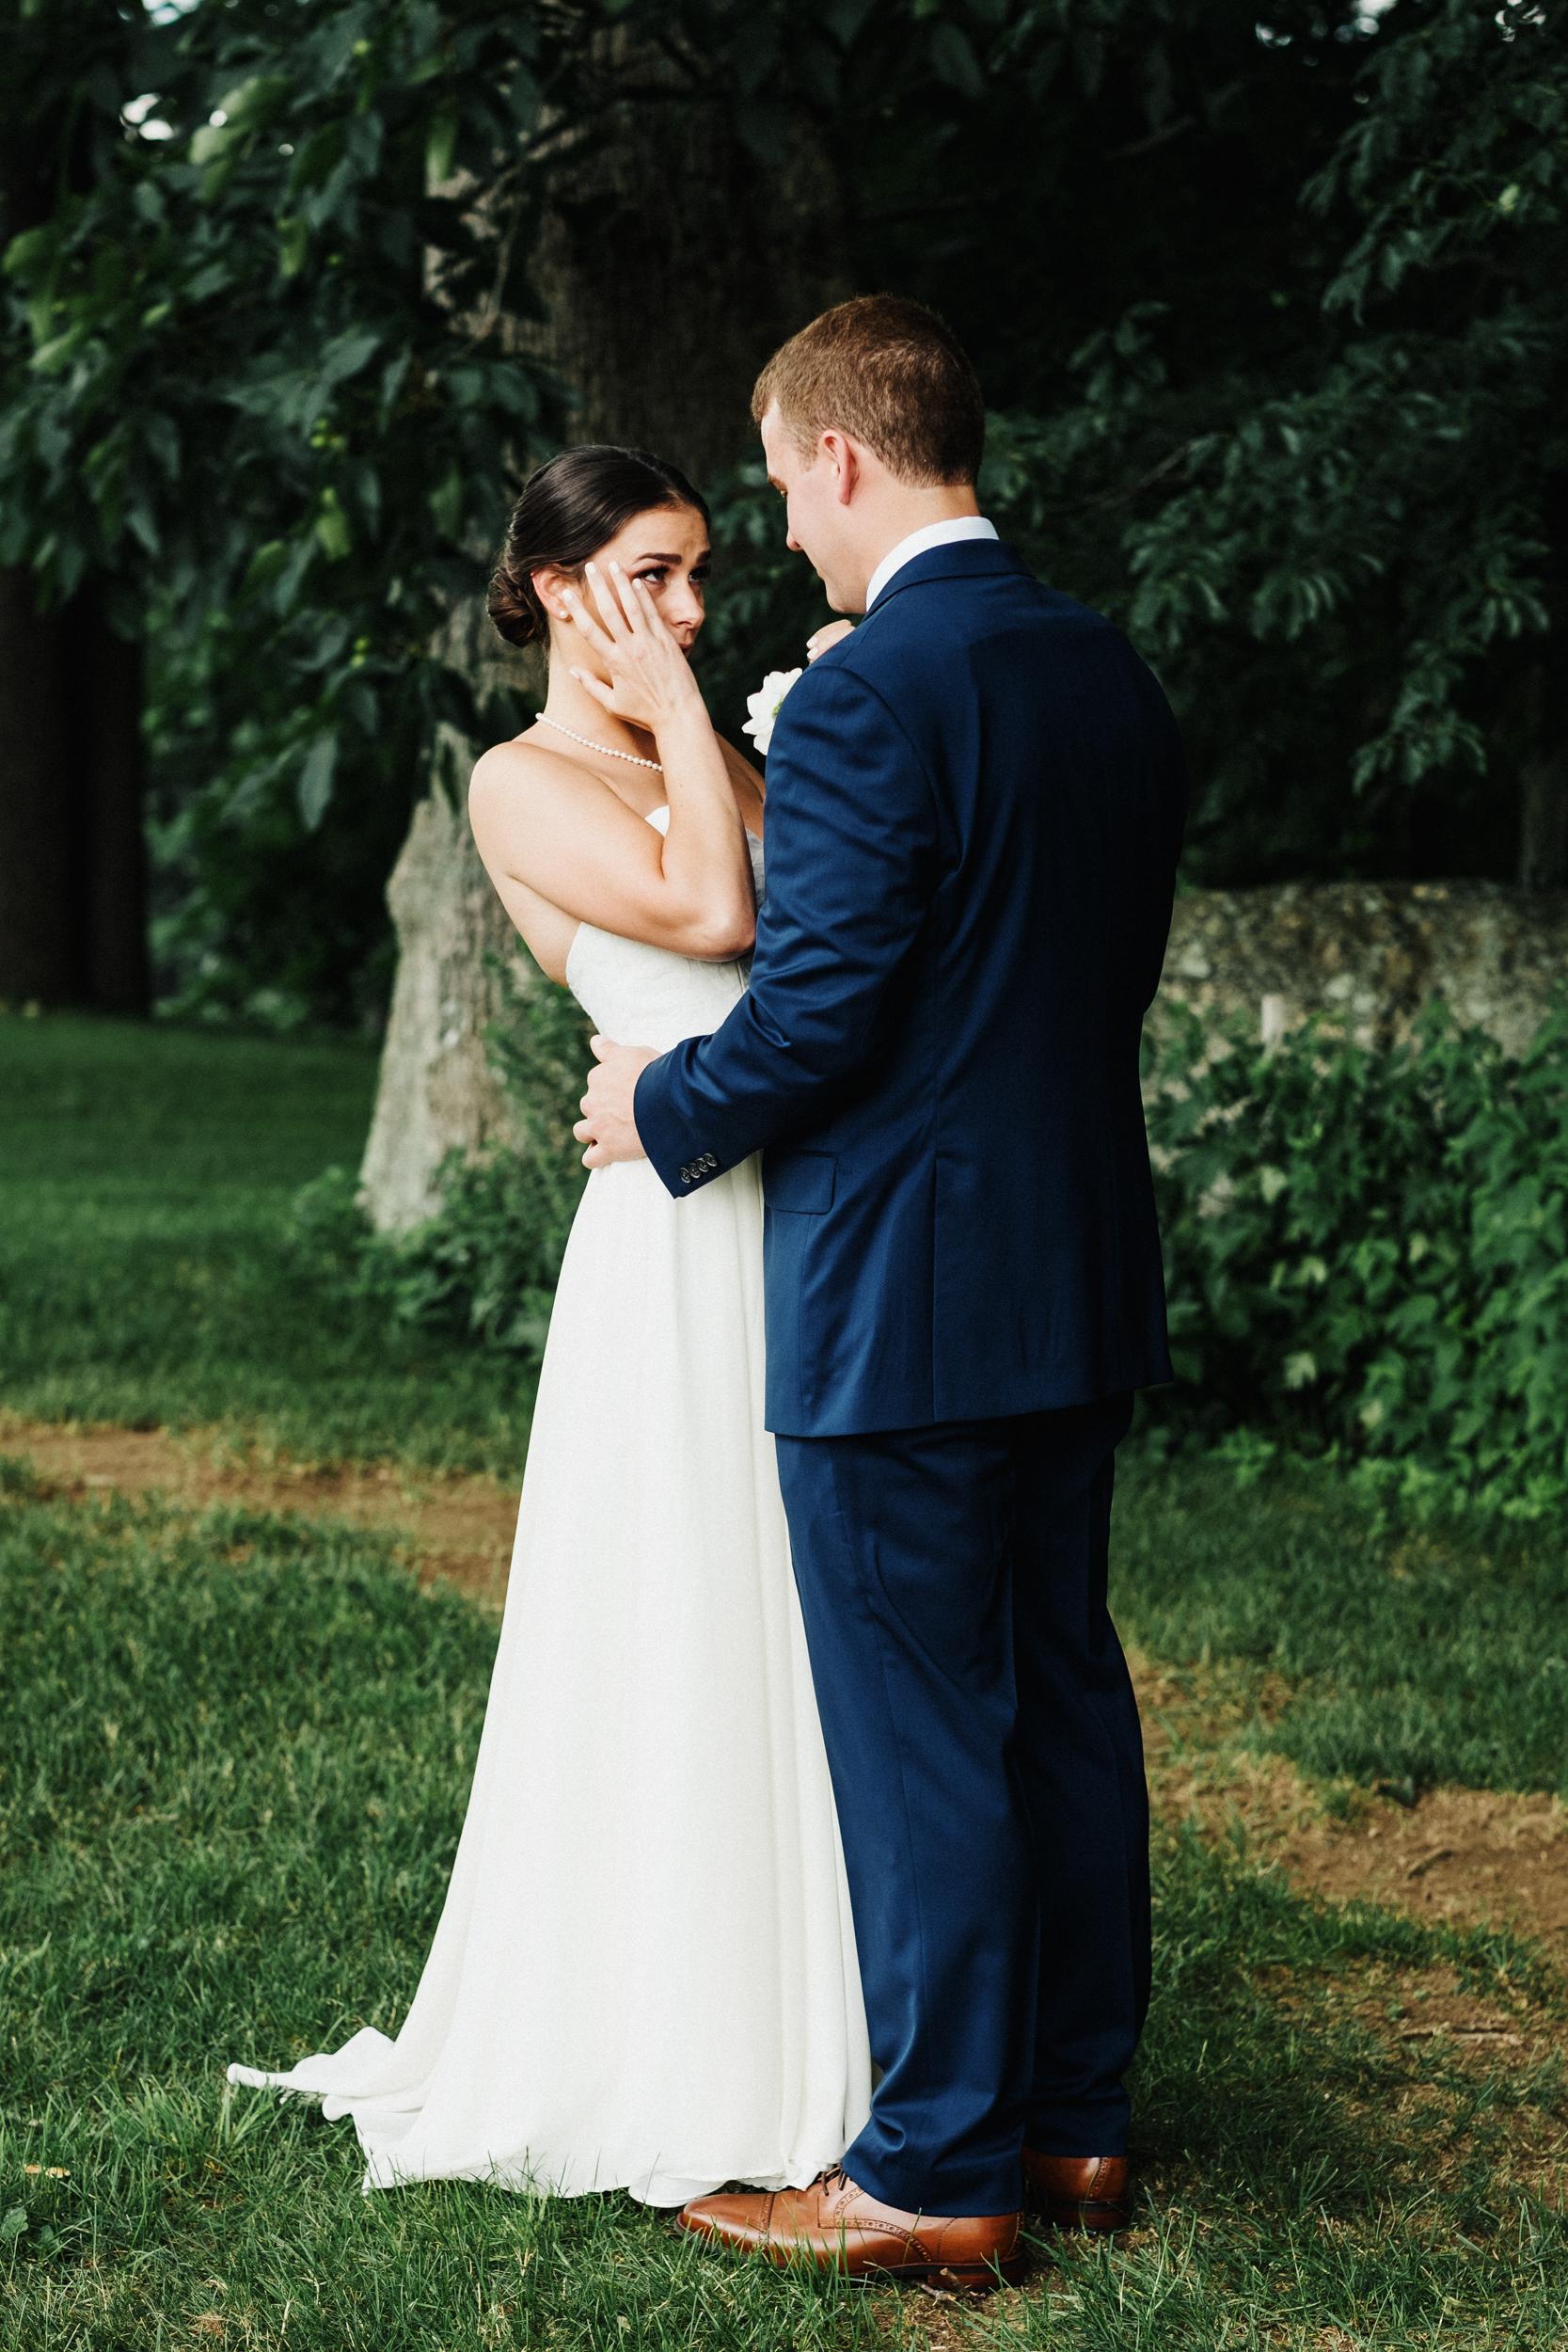 Wedding_Francis_Boucher_zukas_farm_2018-23.jpg